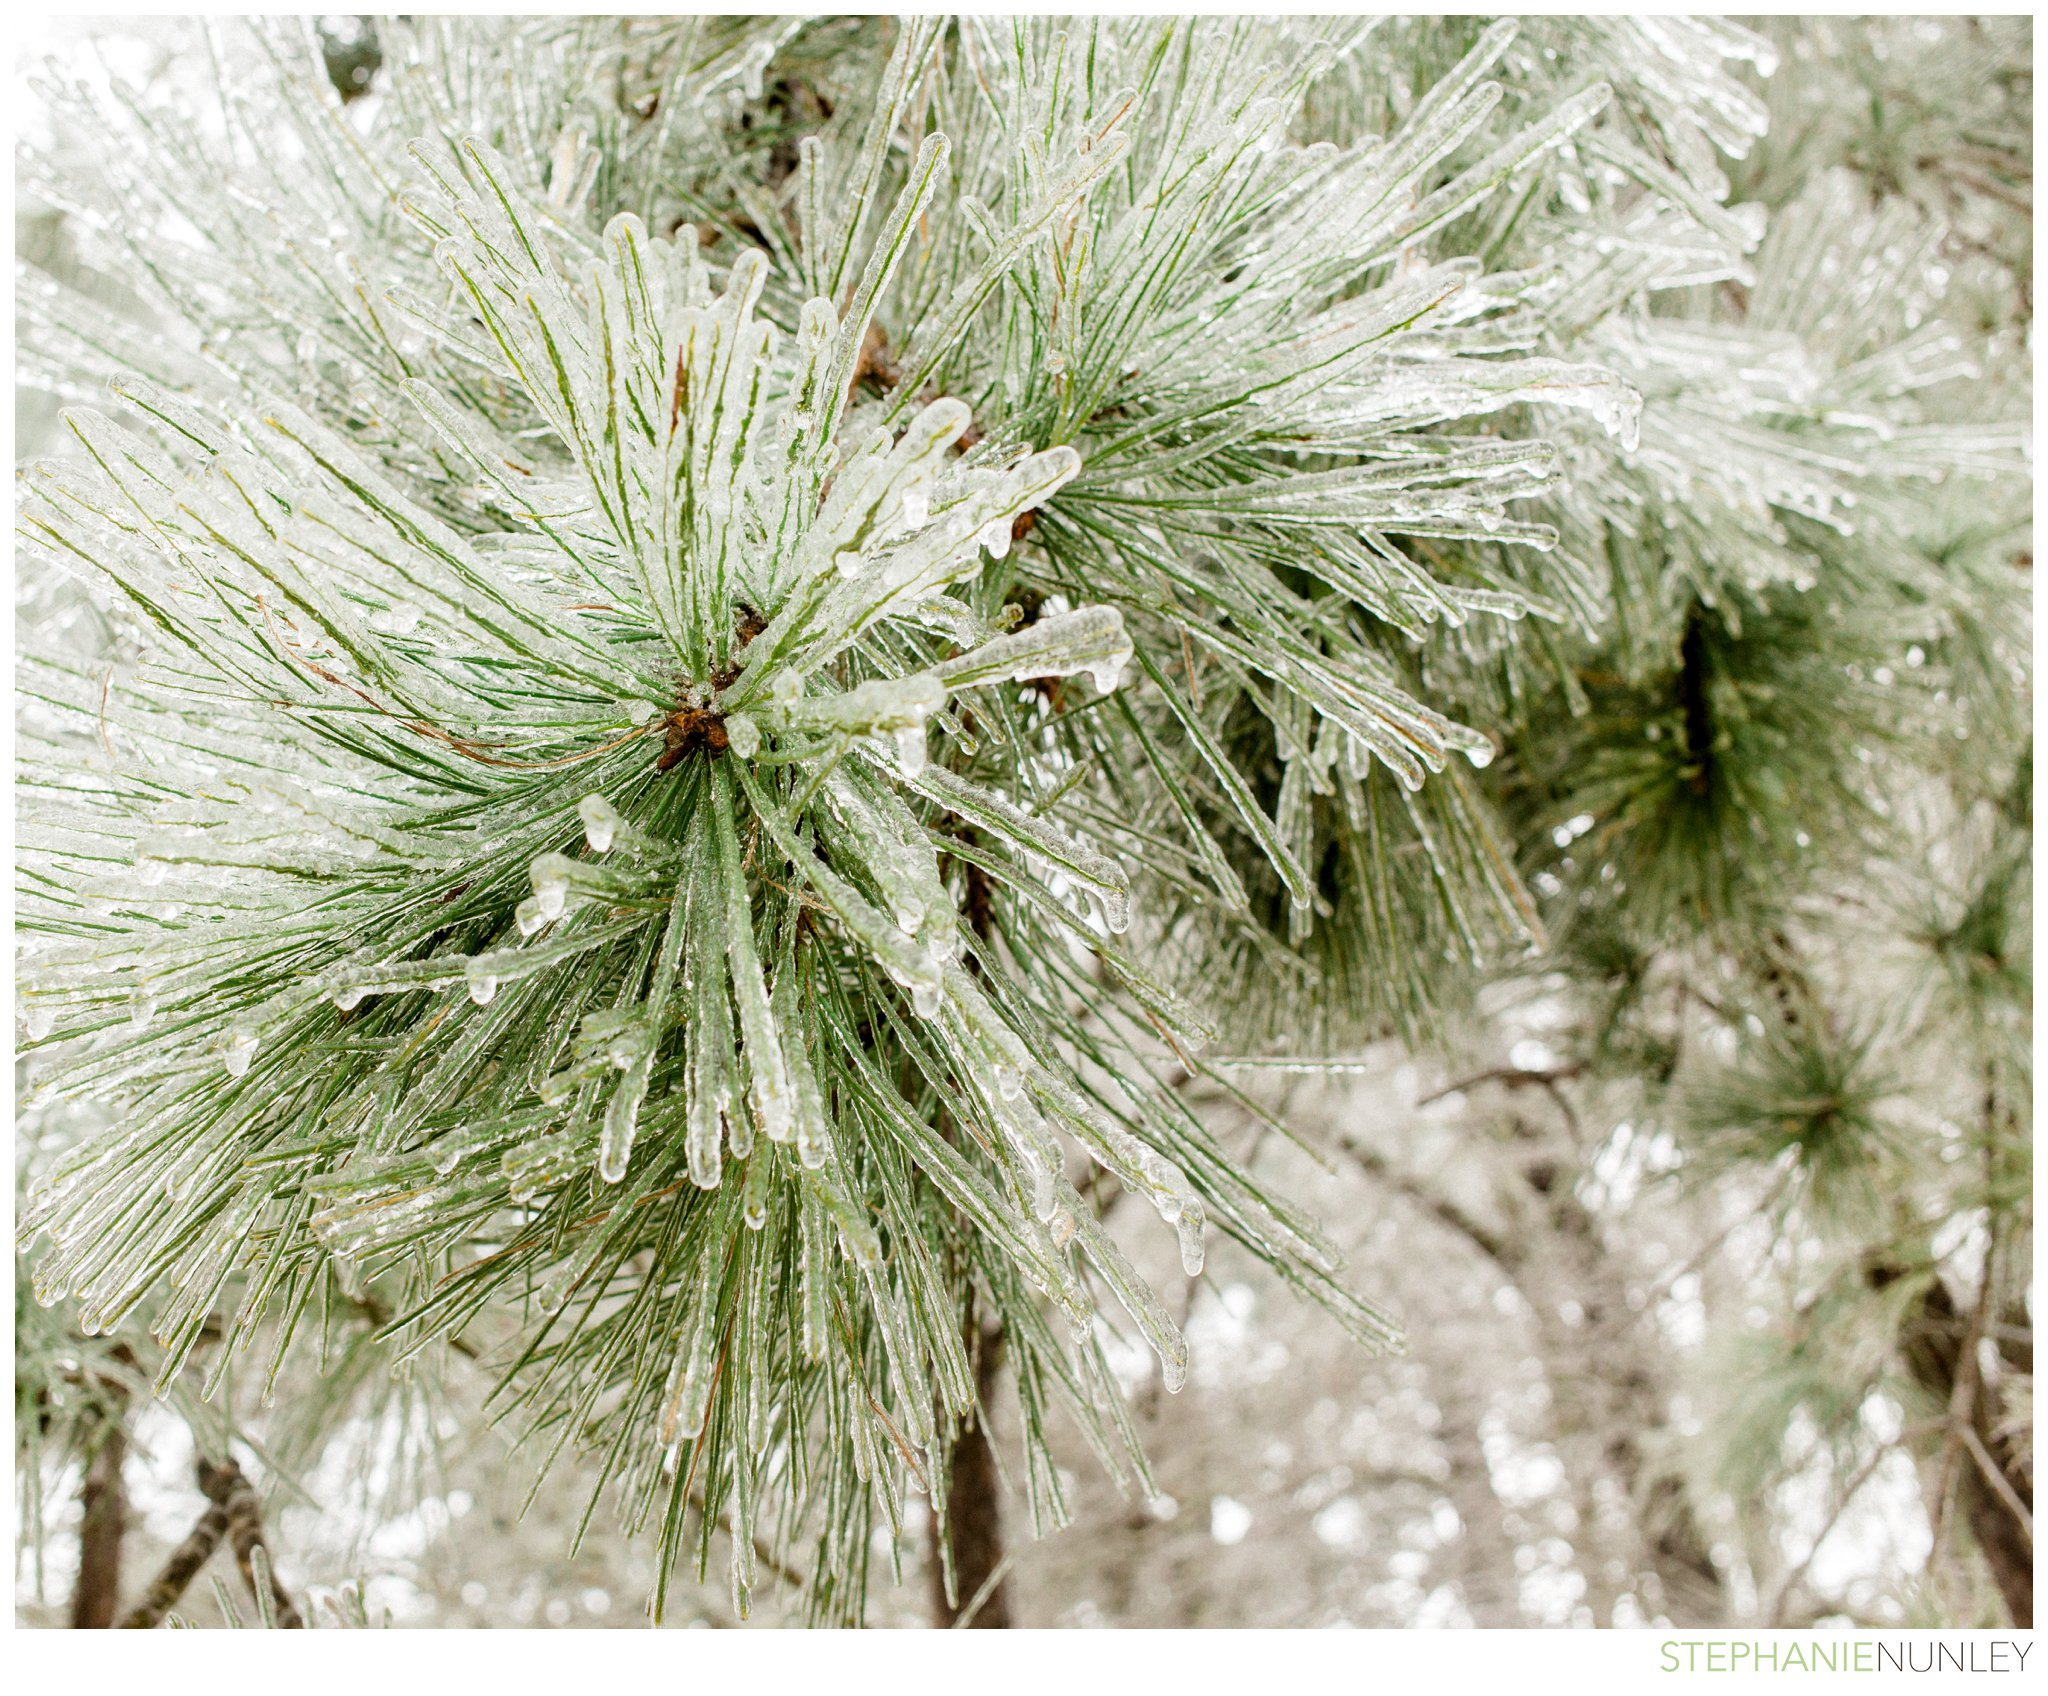 arkansas-winter-scenery-010.jpg